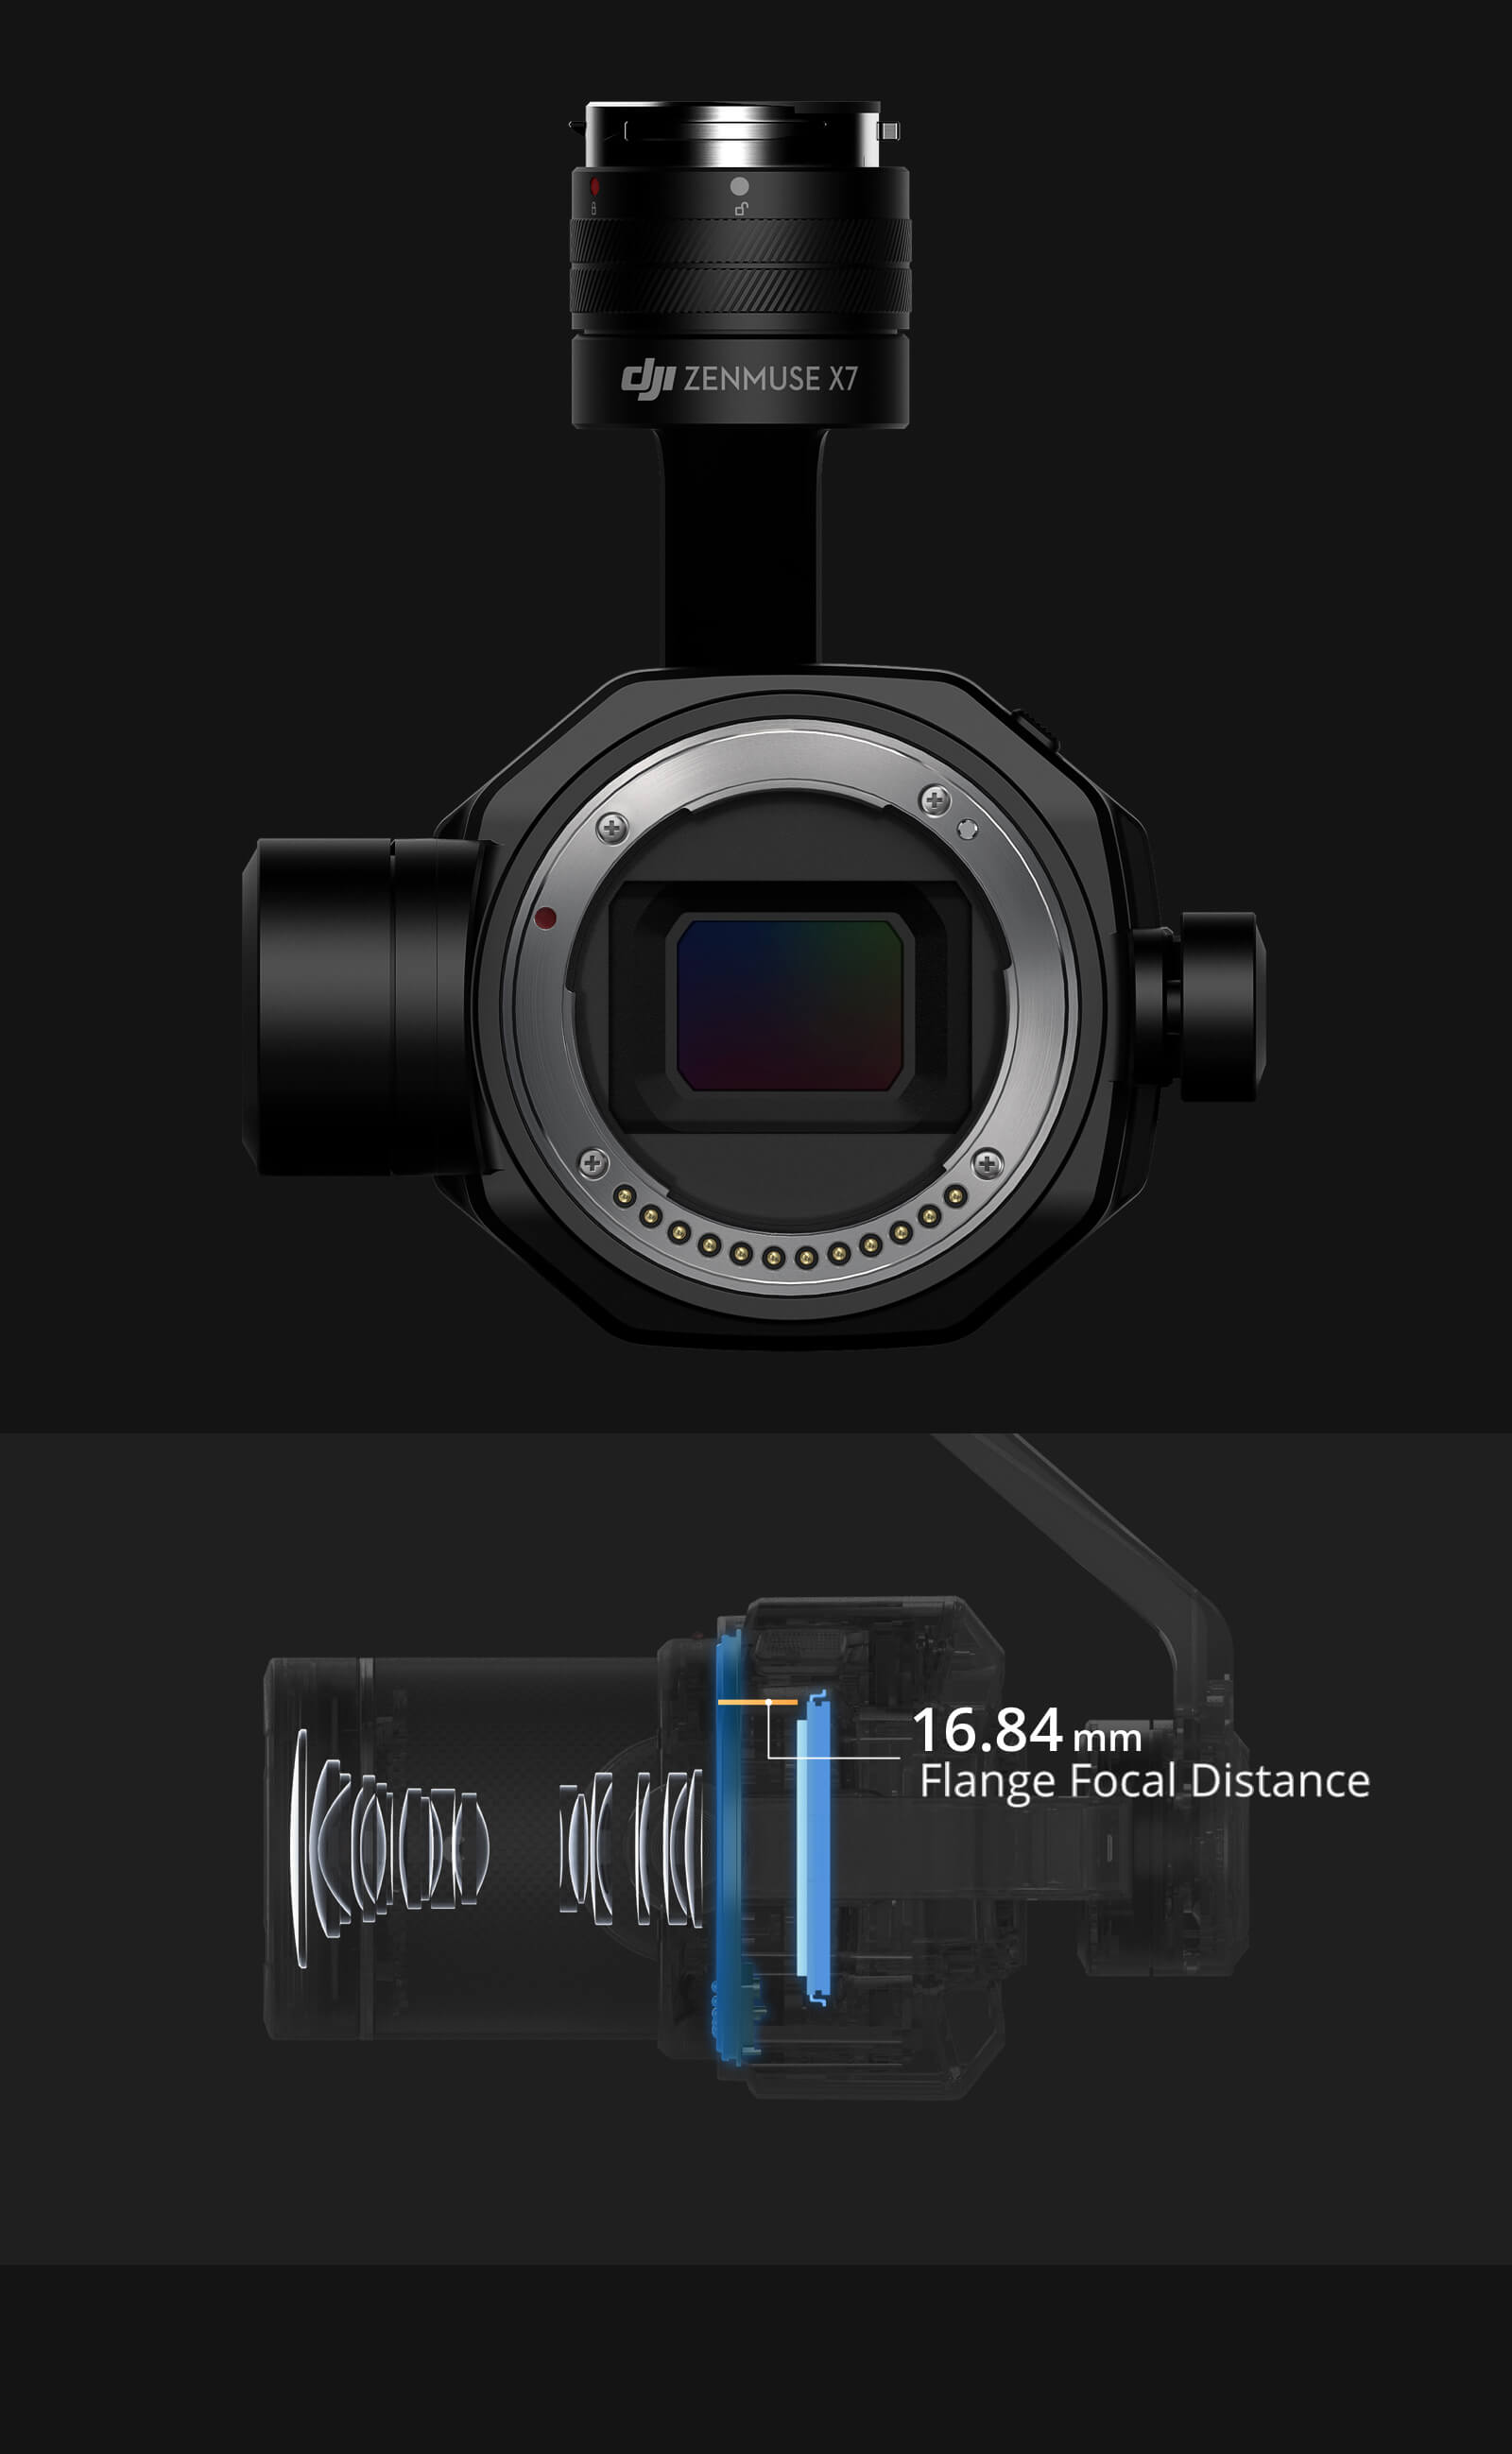 DJI Zenmuse X7 Lens System